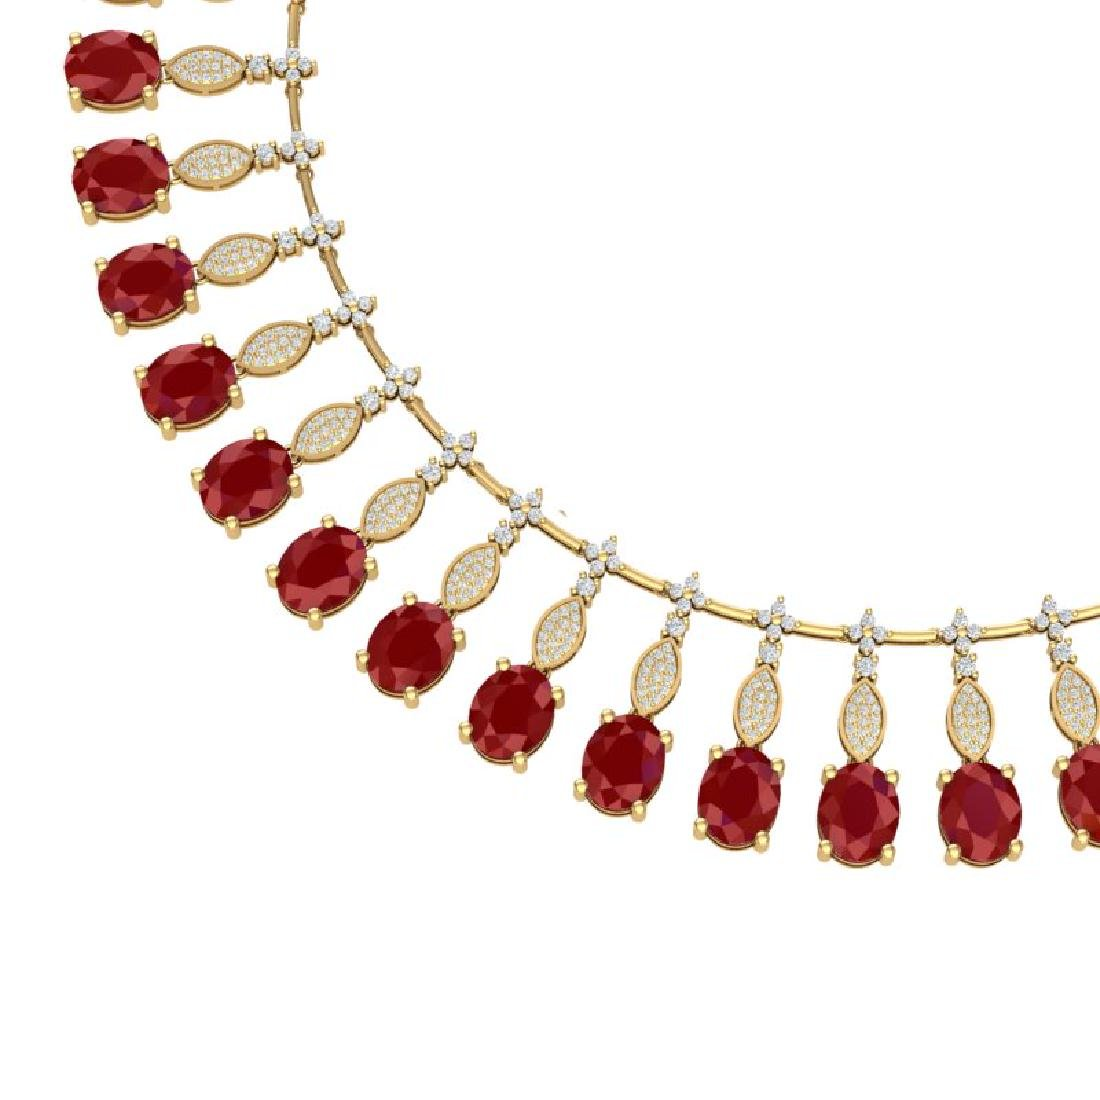 65.62 CTW Royalty Ruby & VS Diamond Necklace 18K Yellow